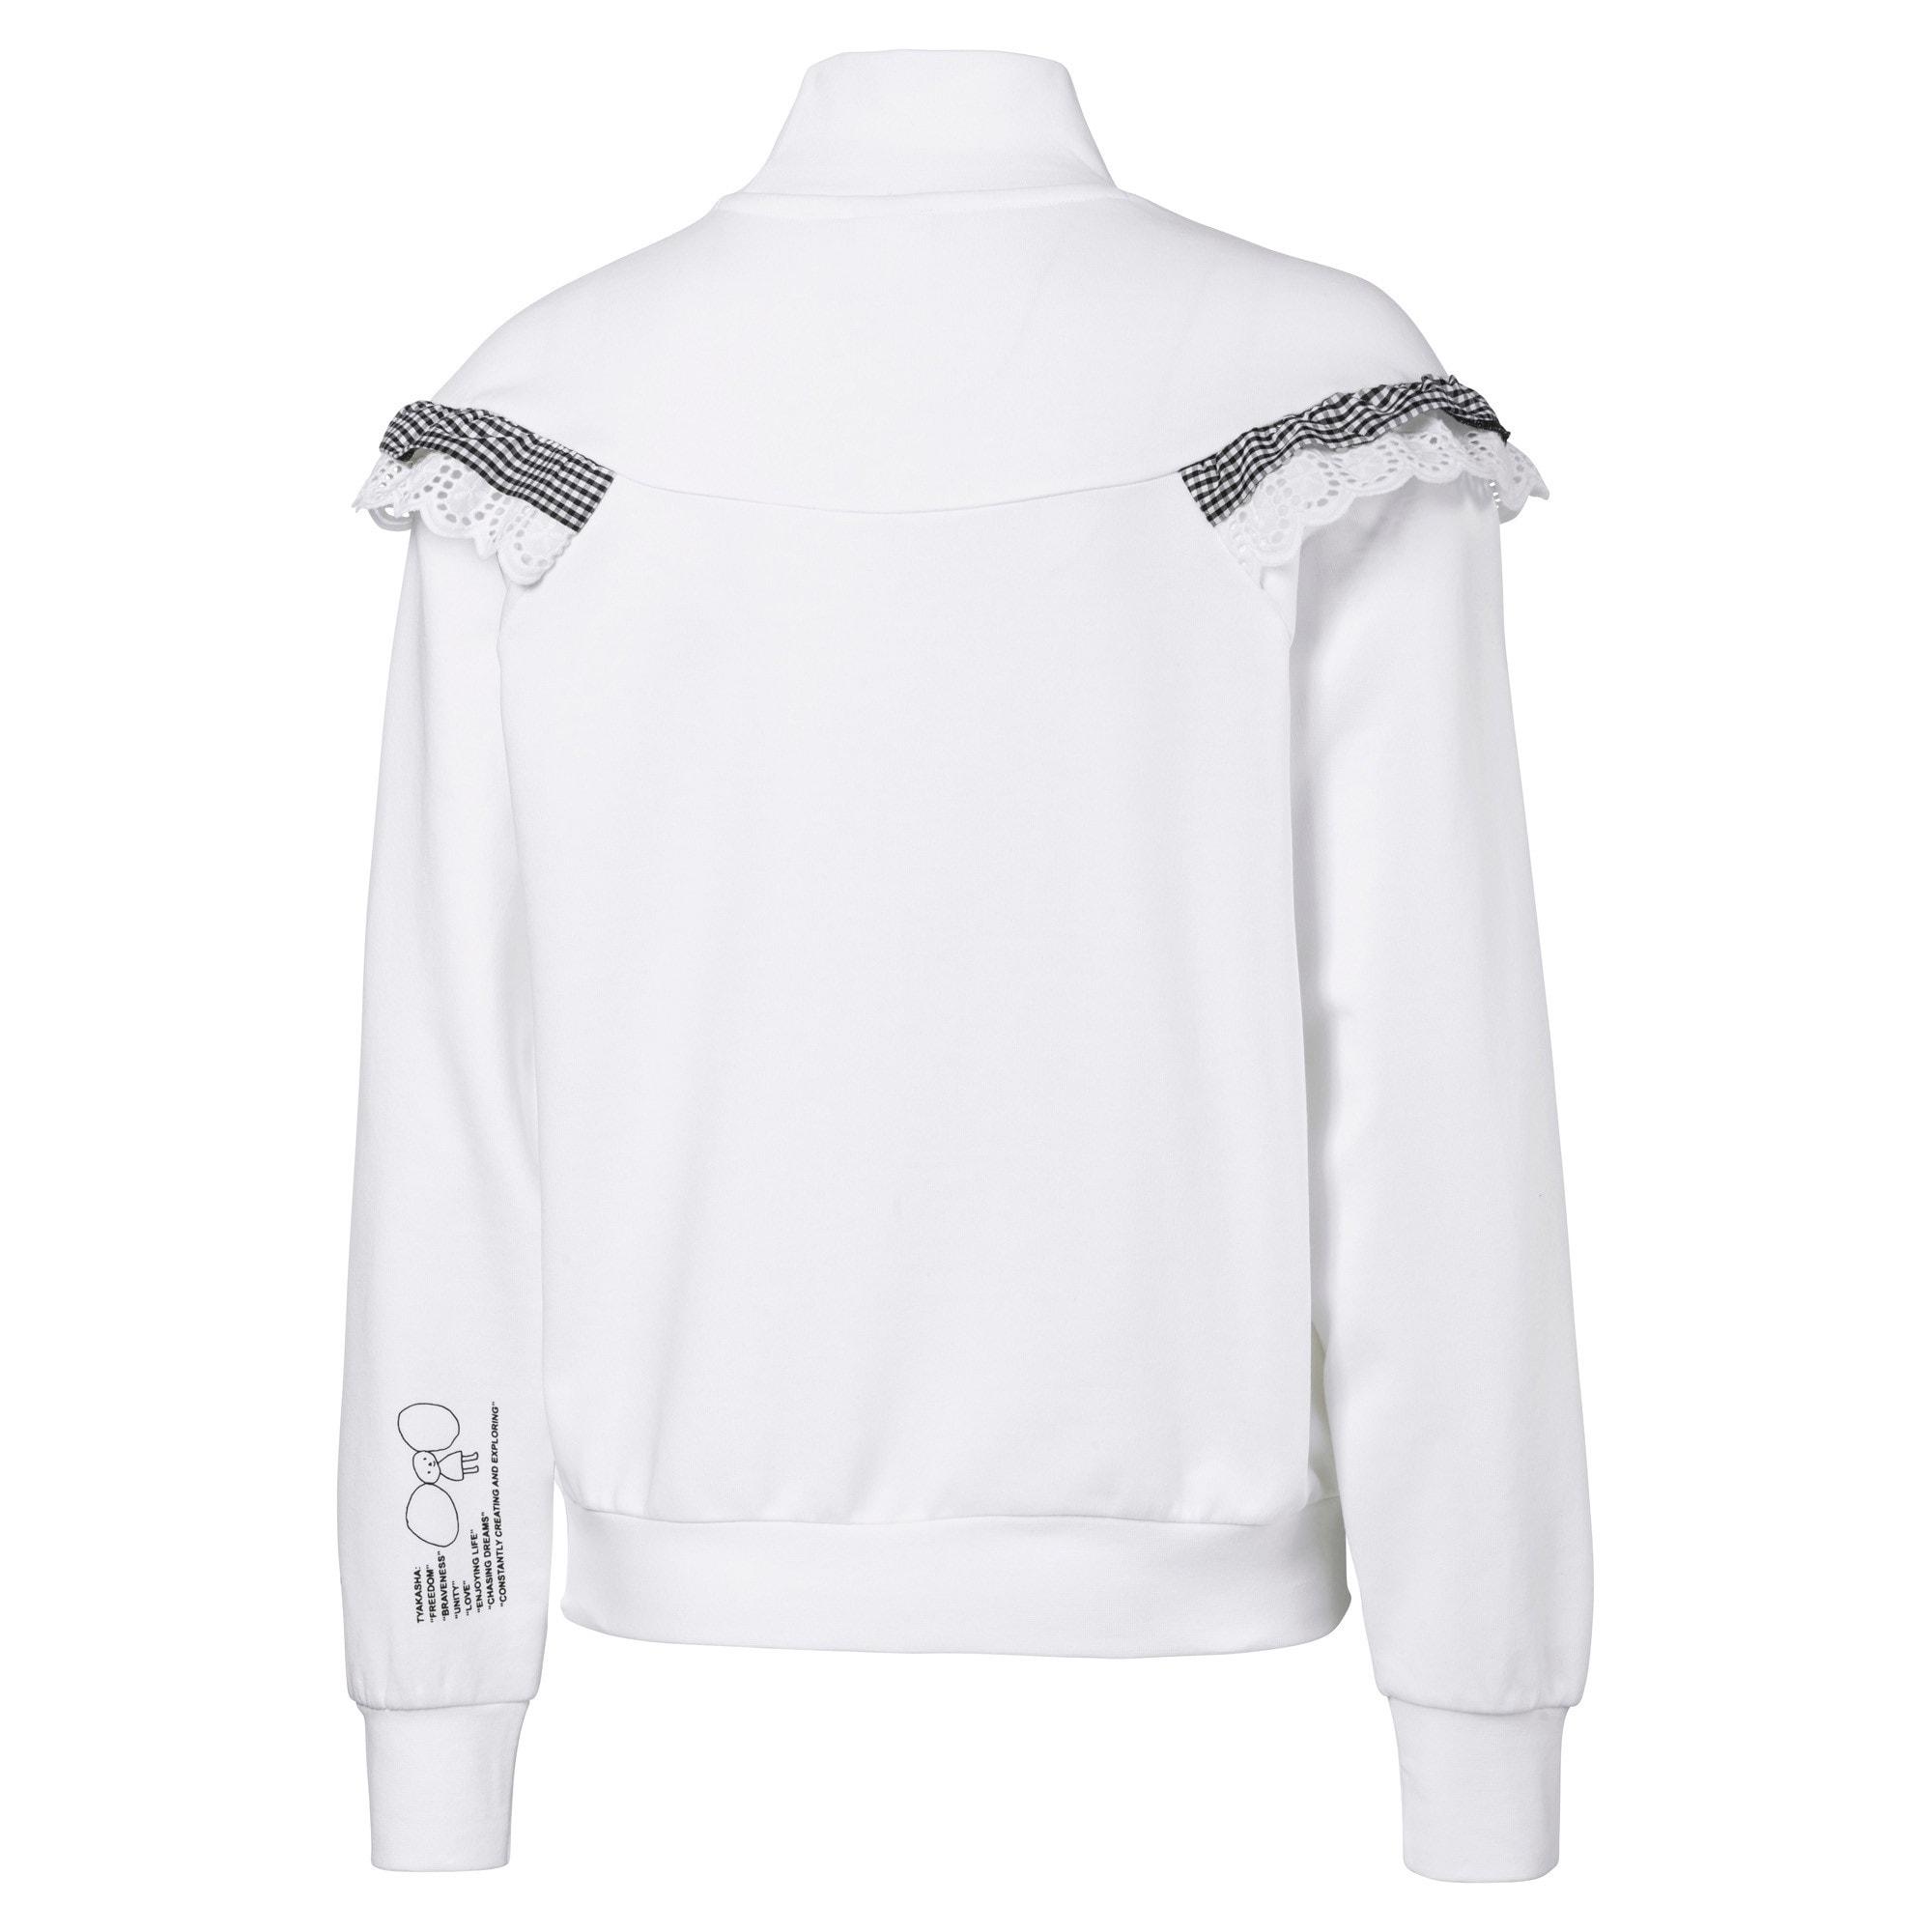 Thumbnail 5 of PUMA x TYAKASHA Women's Turtleneck Sweater, Puma White, medium